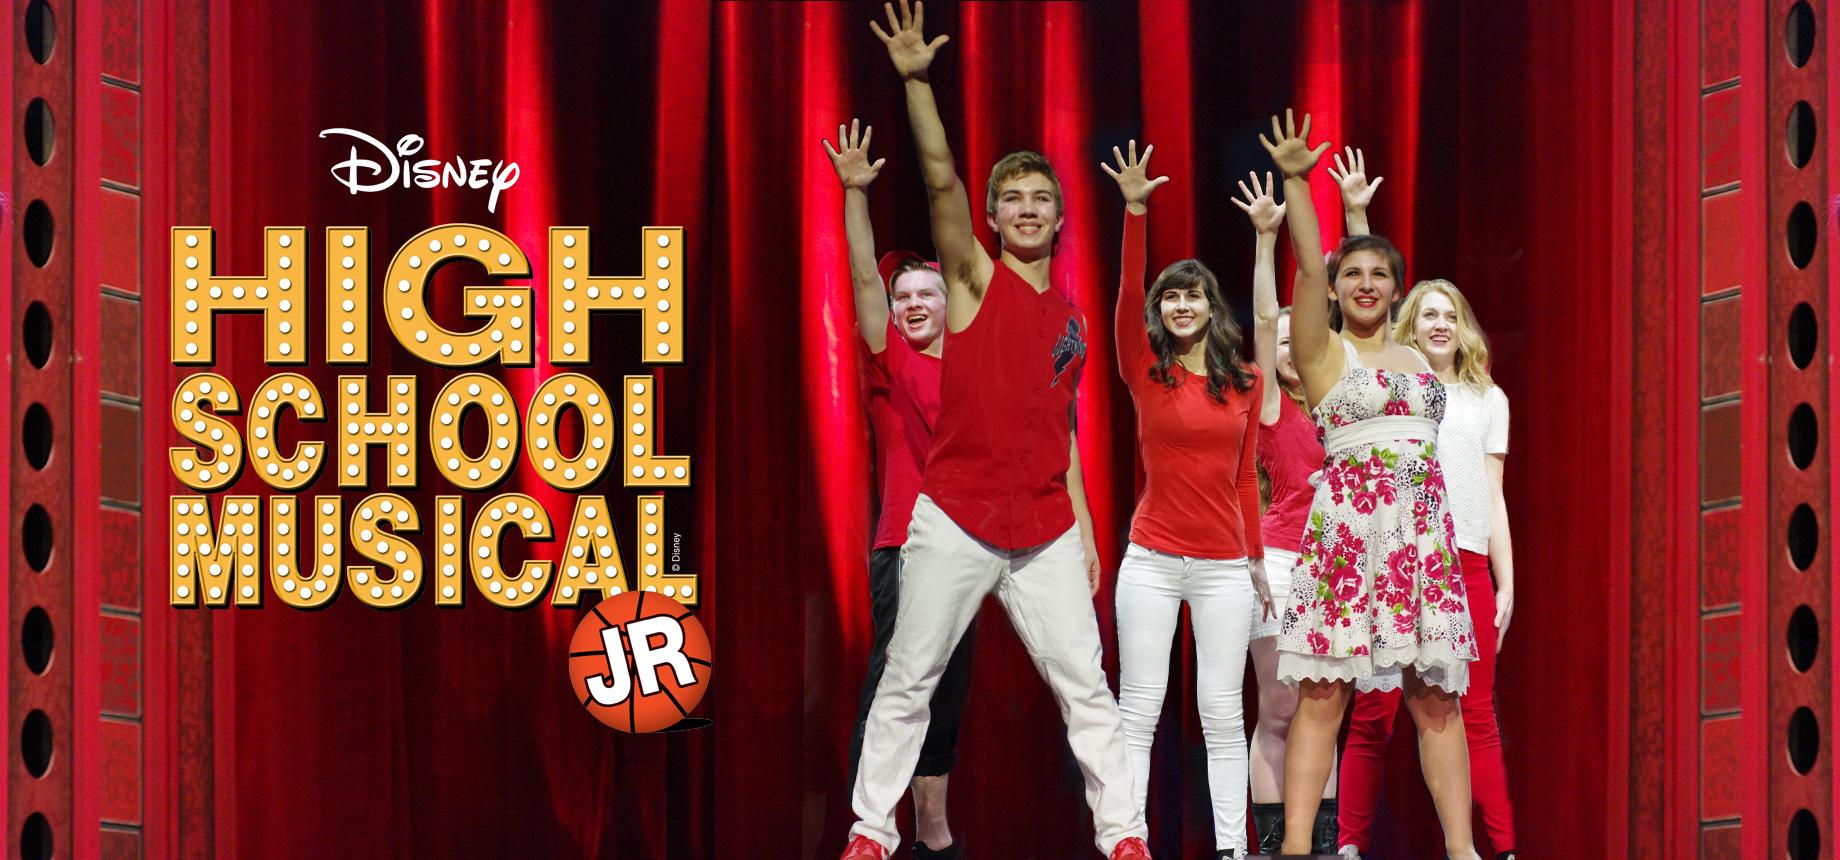 Disney S High School Musical Jr